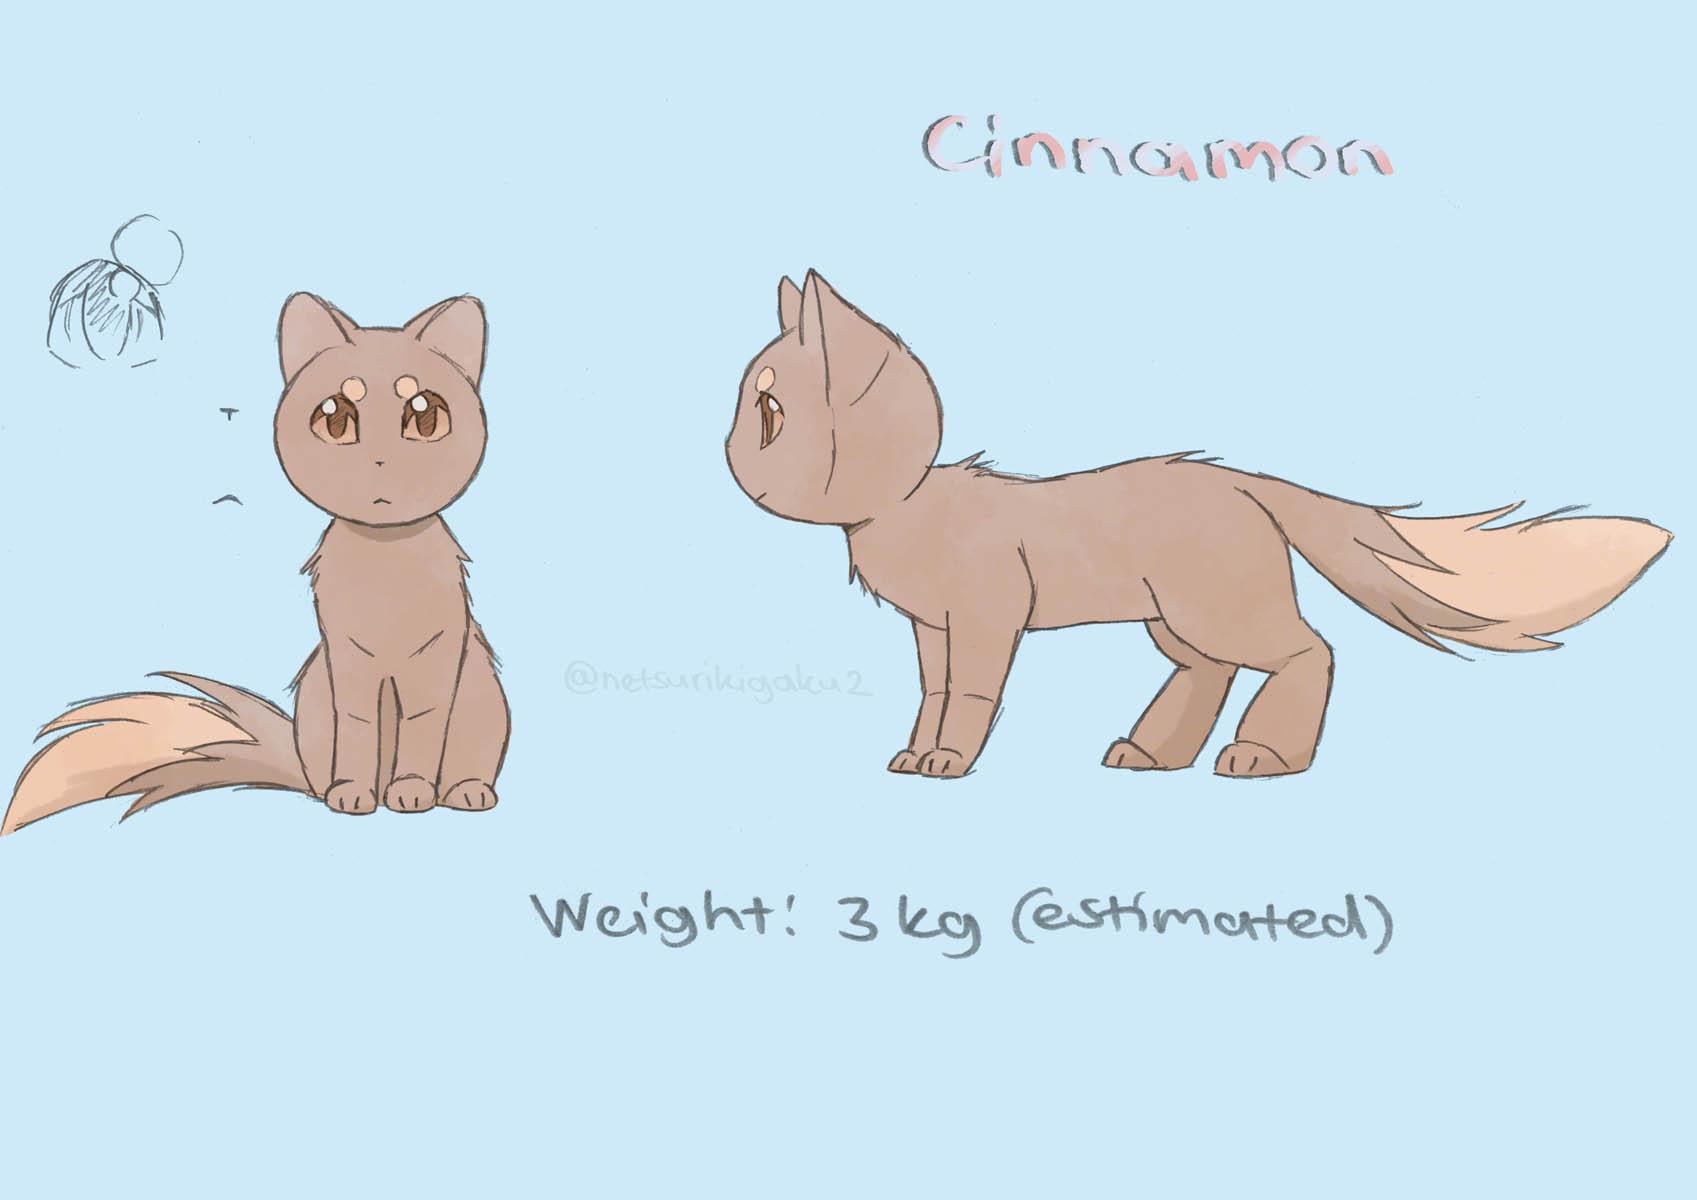 Cinnamonのキャラクター紹介